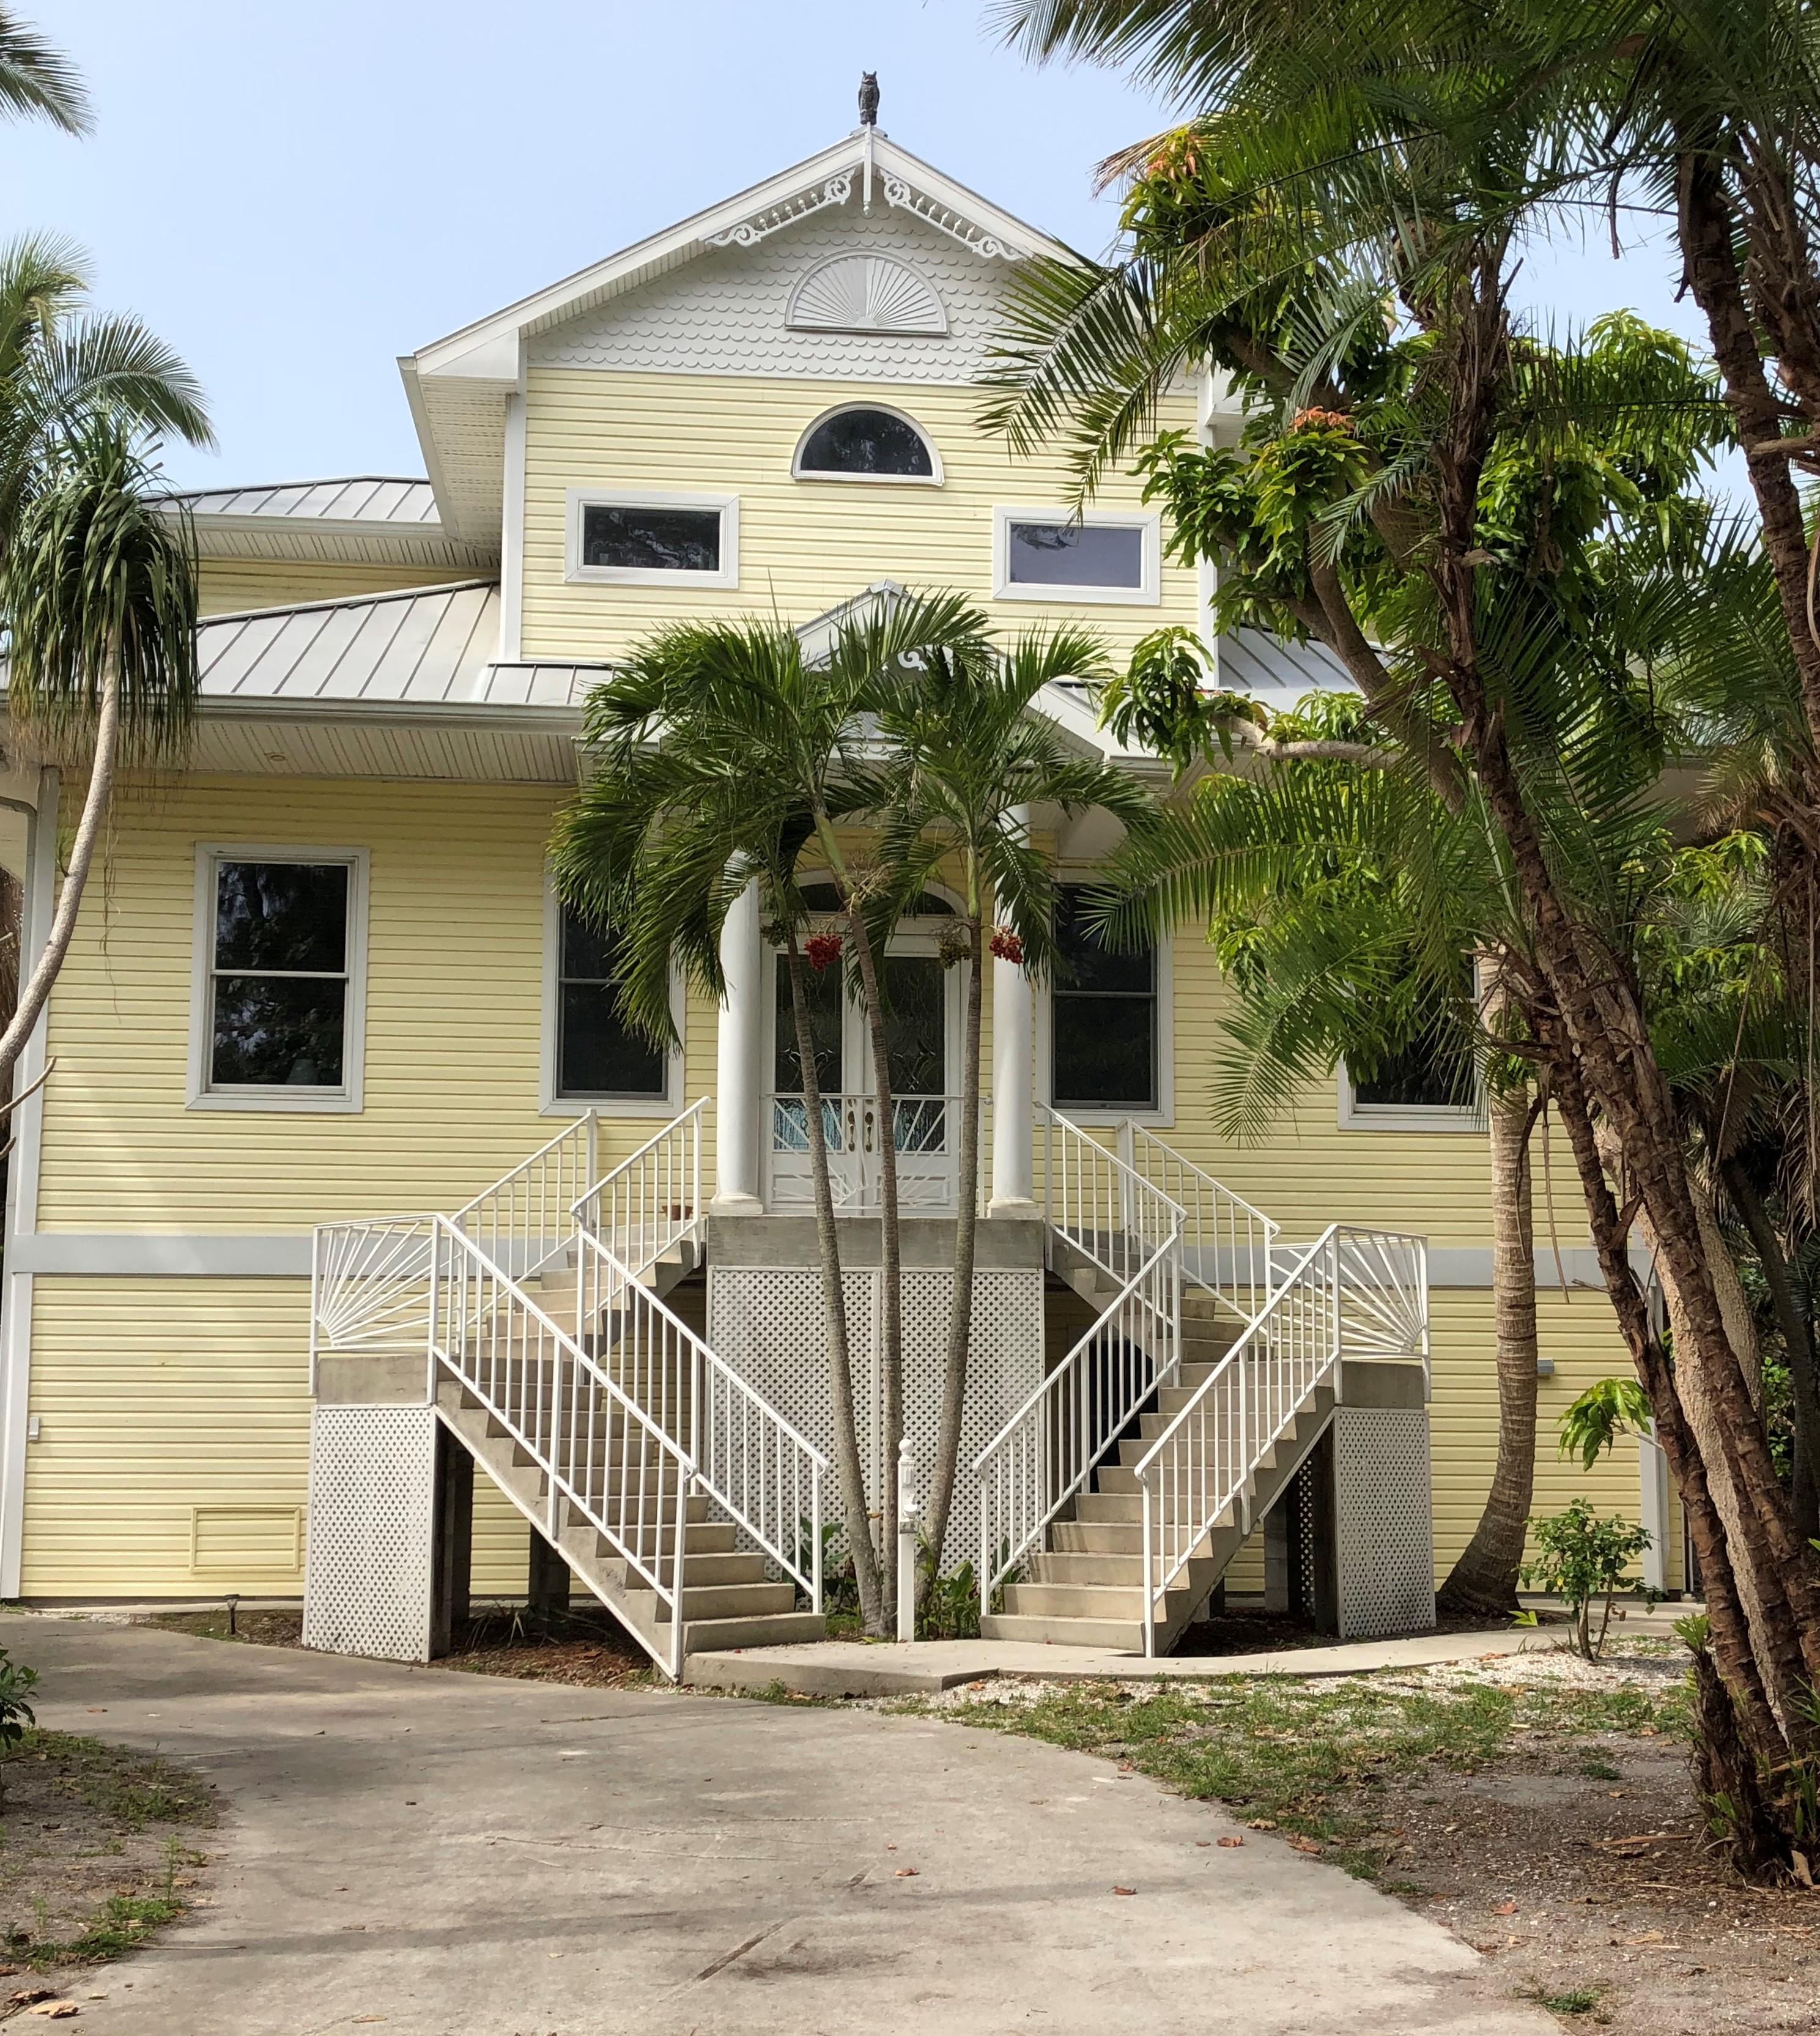 Englewood 02 - Vacation Rental in Englewood,FL | Gulf ...